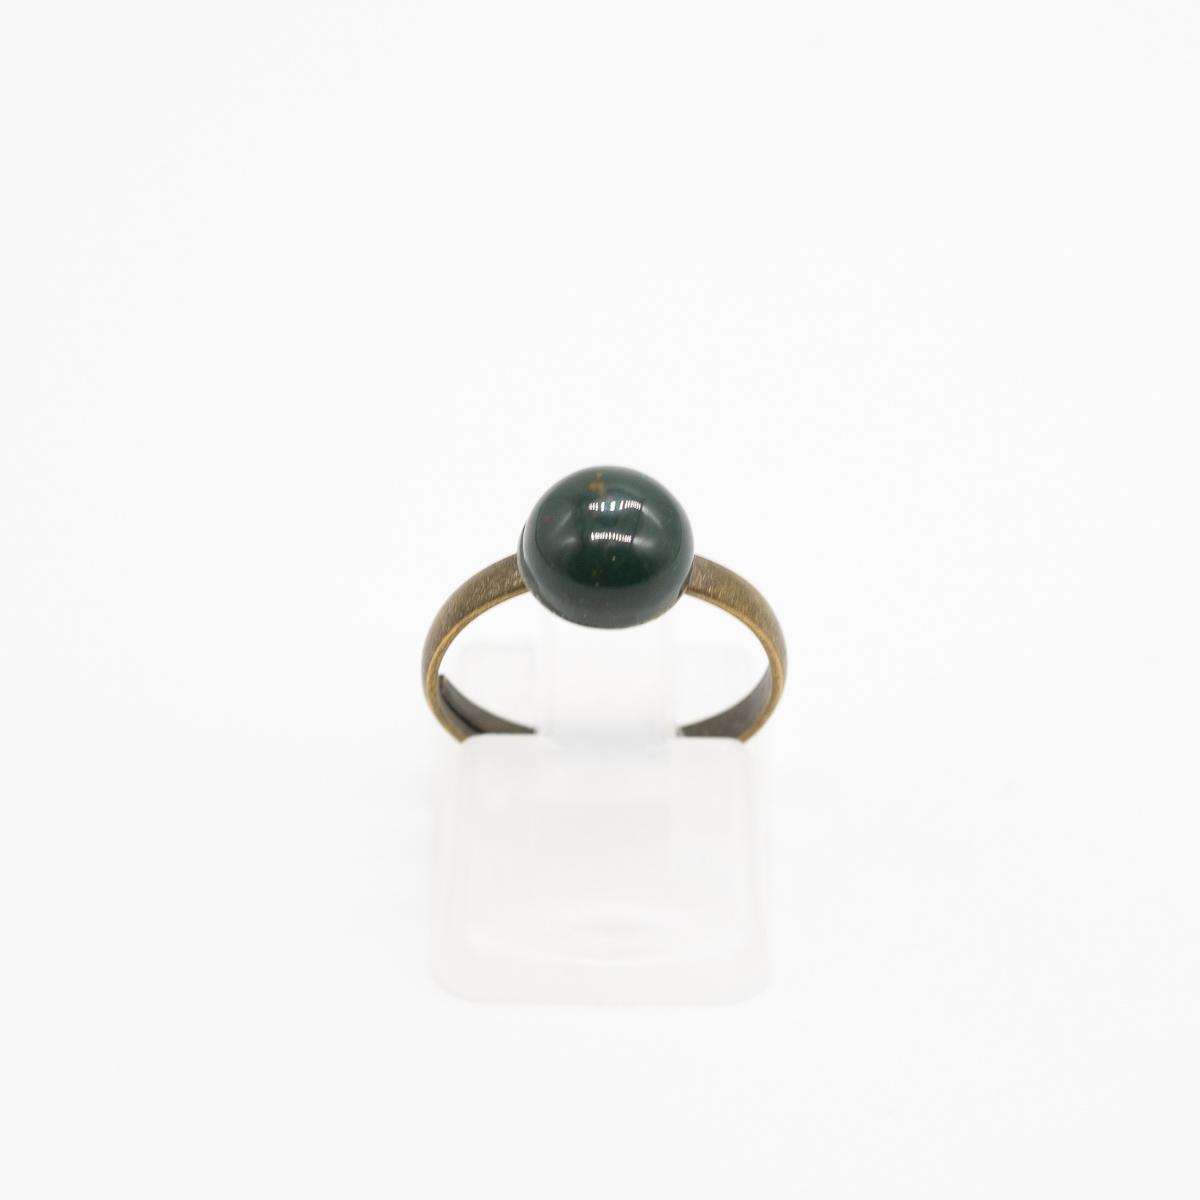 RNG-019 jaspis groen ring brons